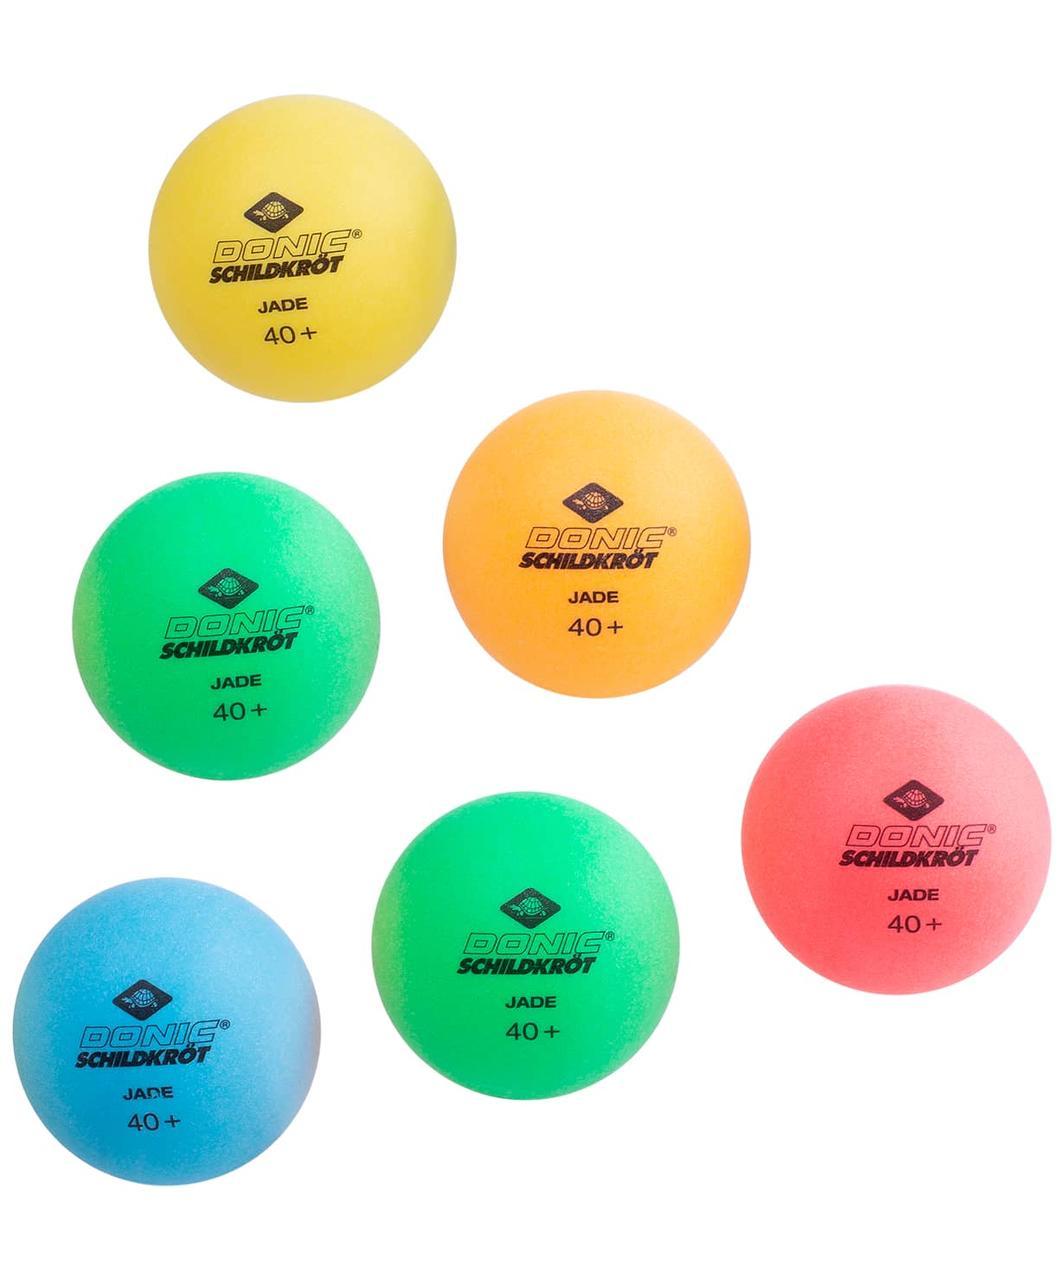 Мяч для настольного тенниса Colour Popps Poly, 6 шт. Donic